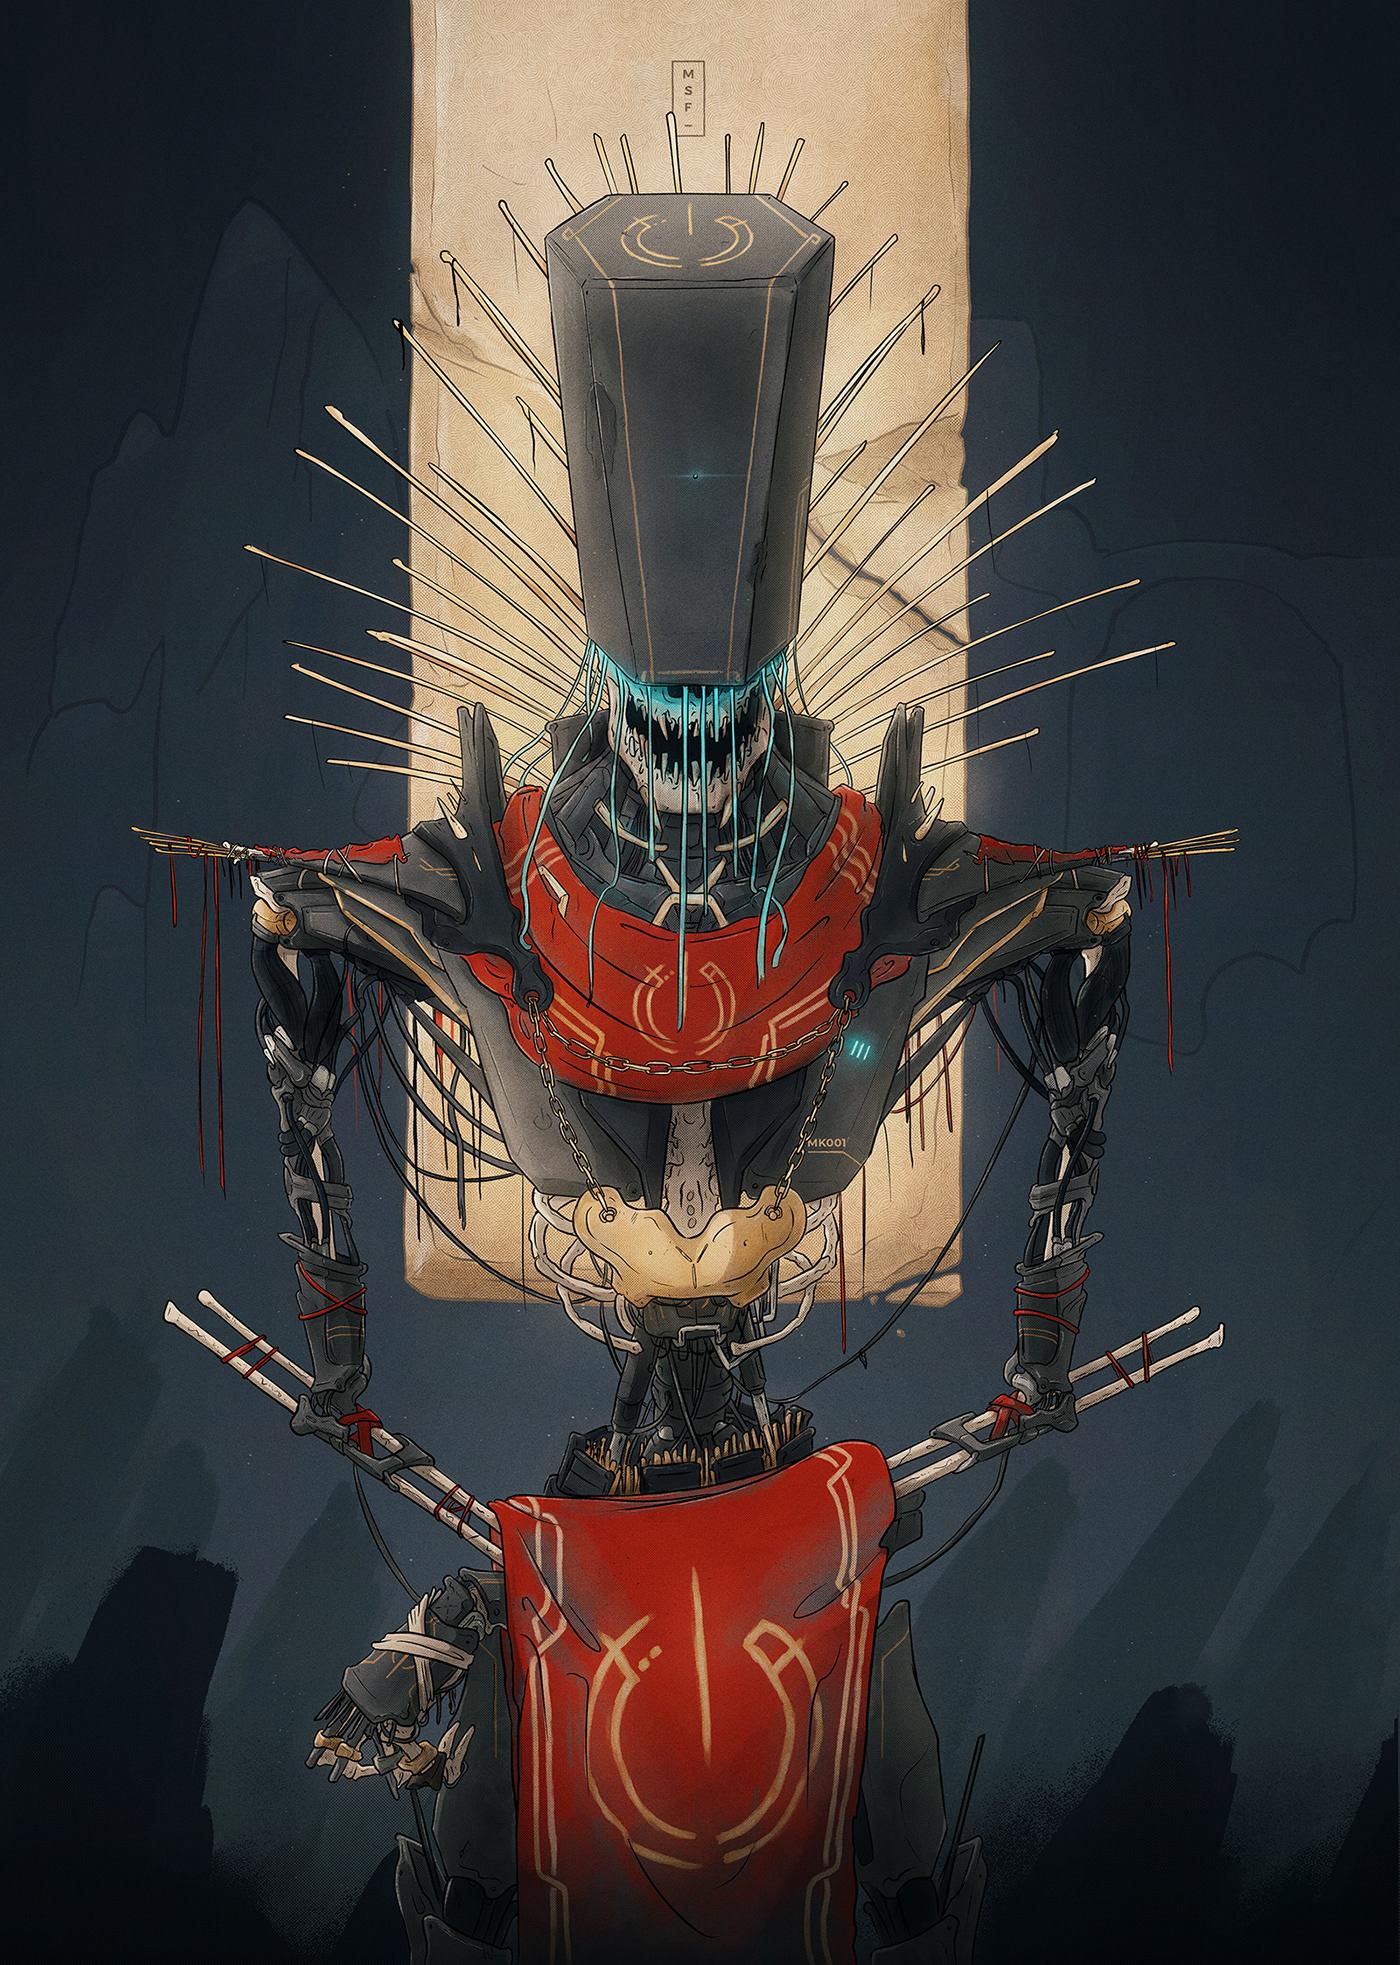 dictator print religion Cyborg church artificial intelligence future iPad priest